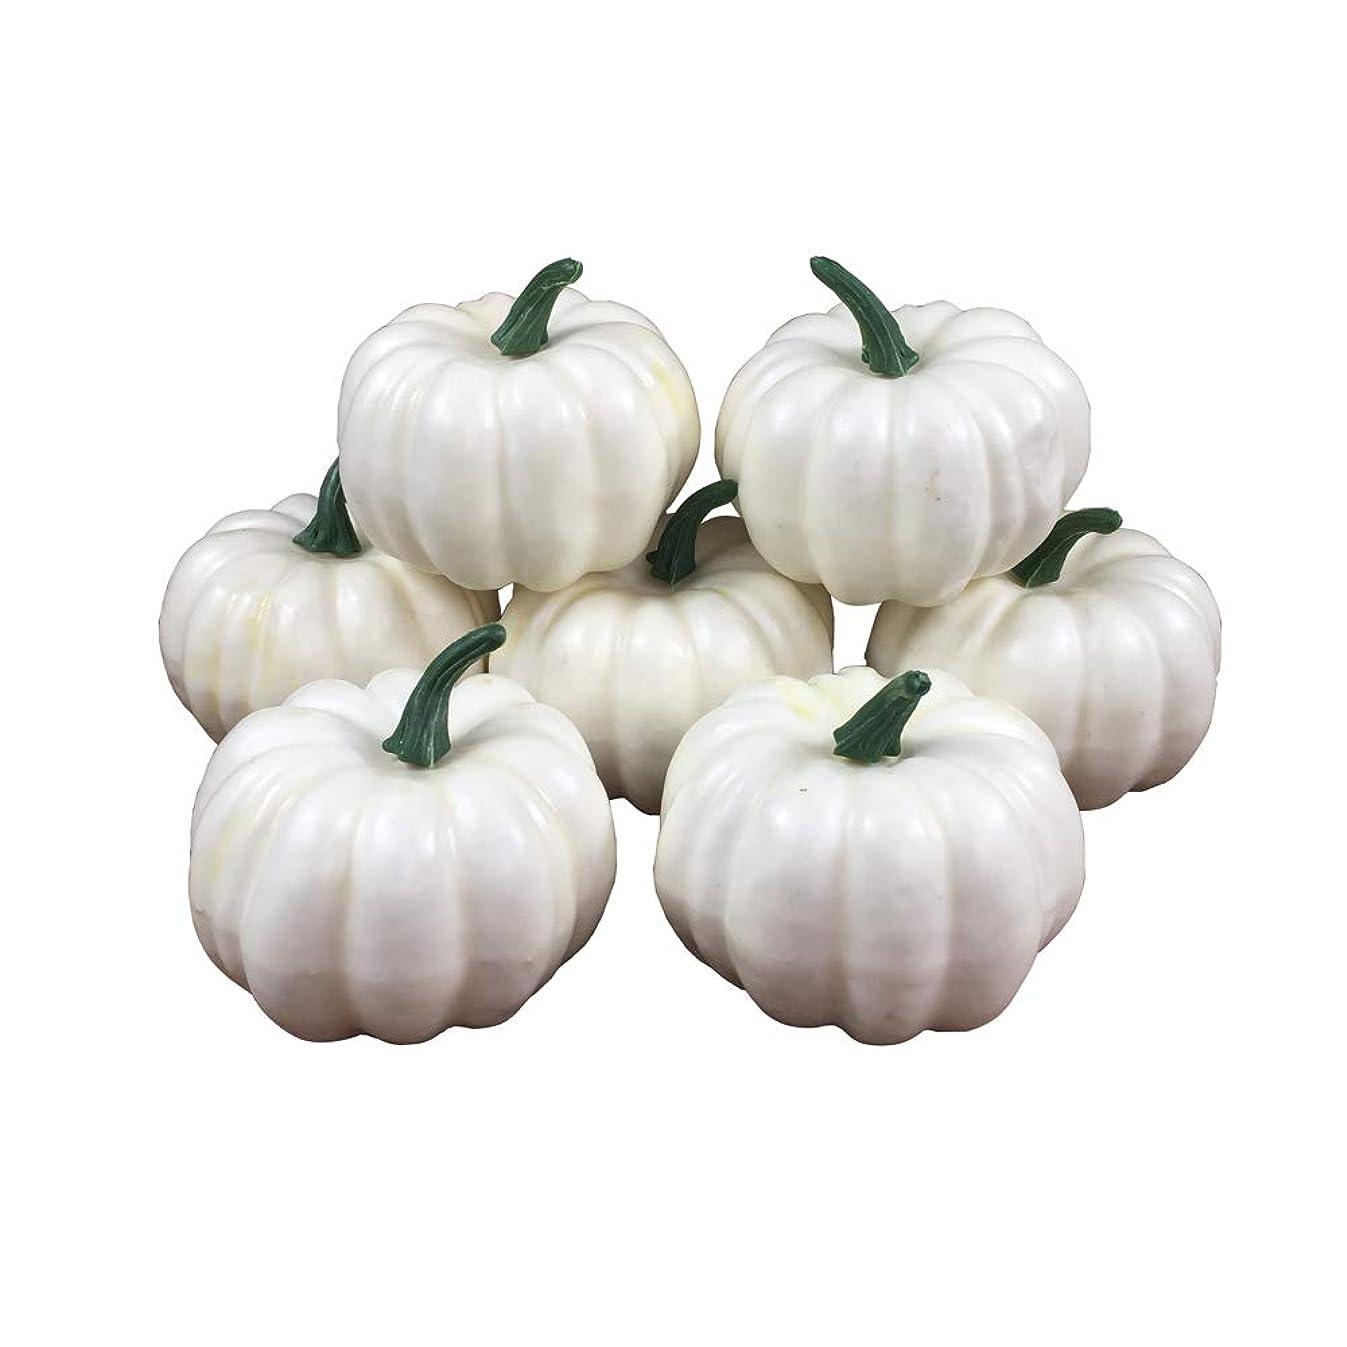 SOSAM Lifelike Simulation Artificial Pumpkins 10 Pcs for Festive Wedding Halloween Party Home Decoration (White)